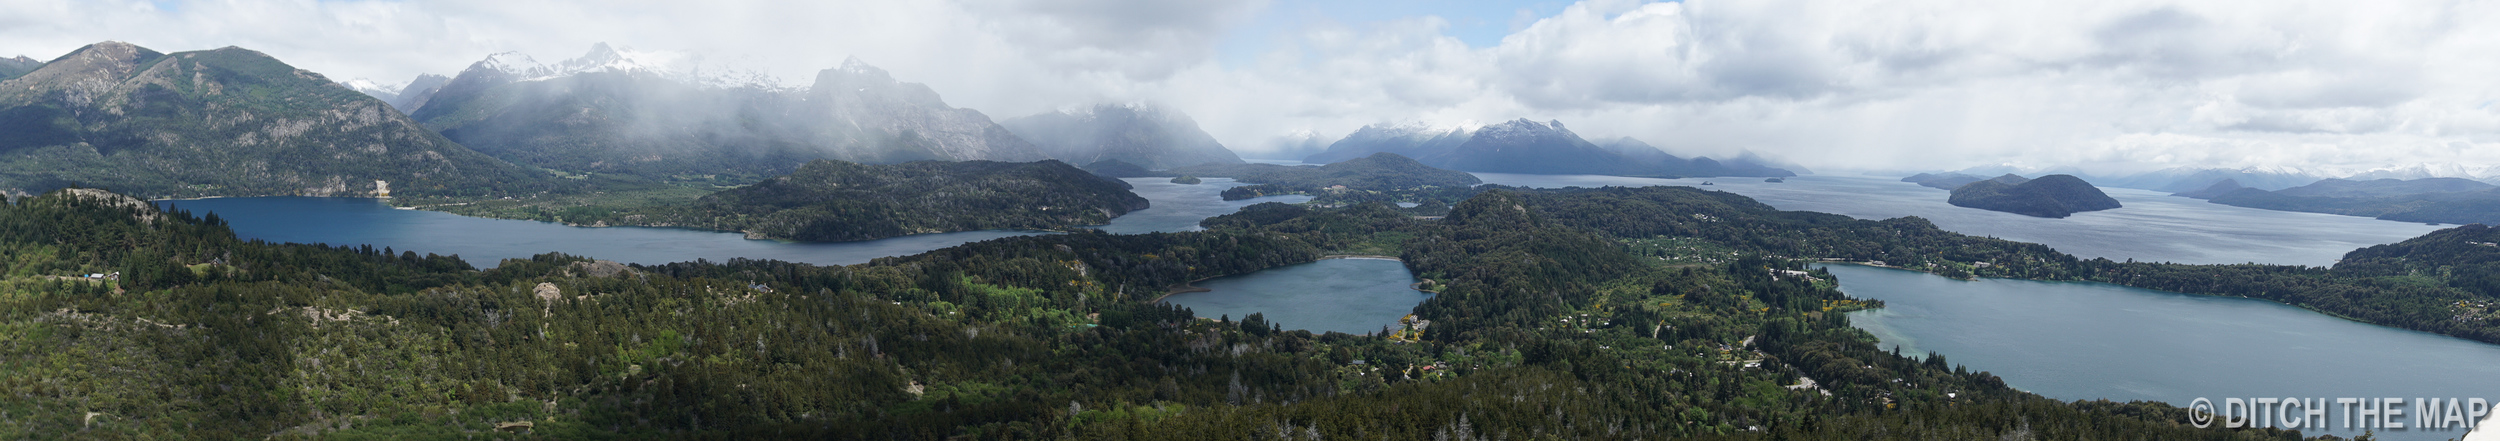 View from the top of Cerro Campanario